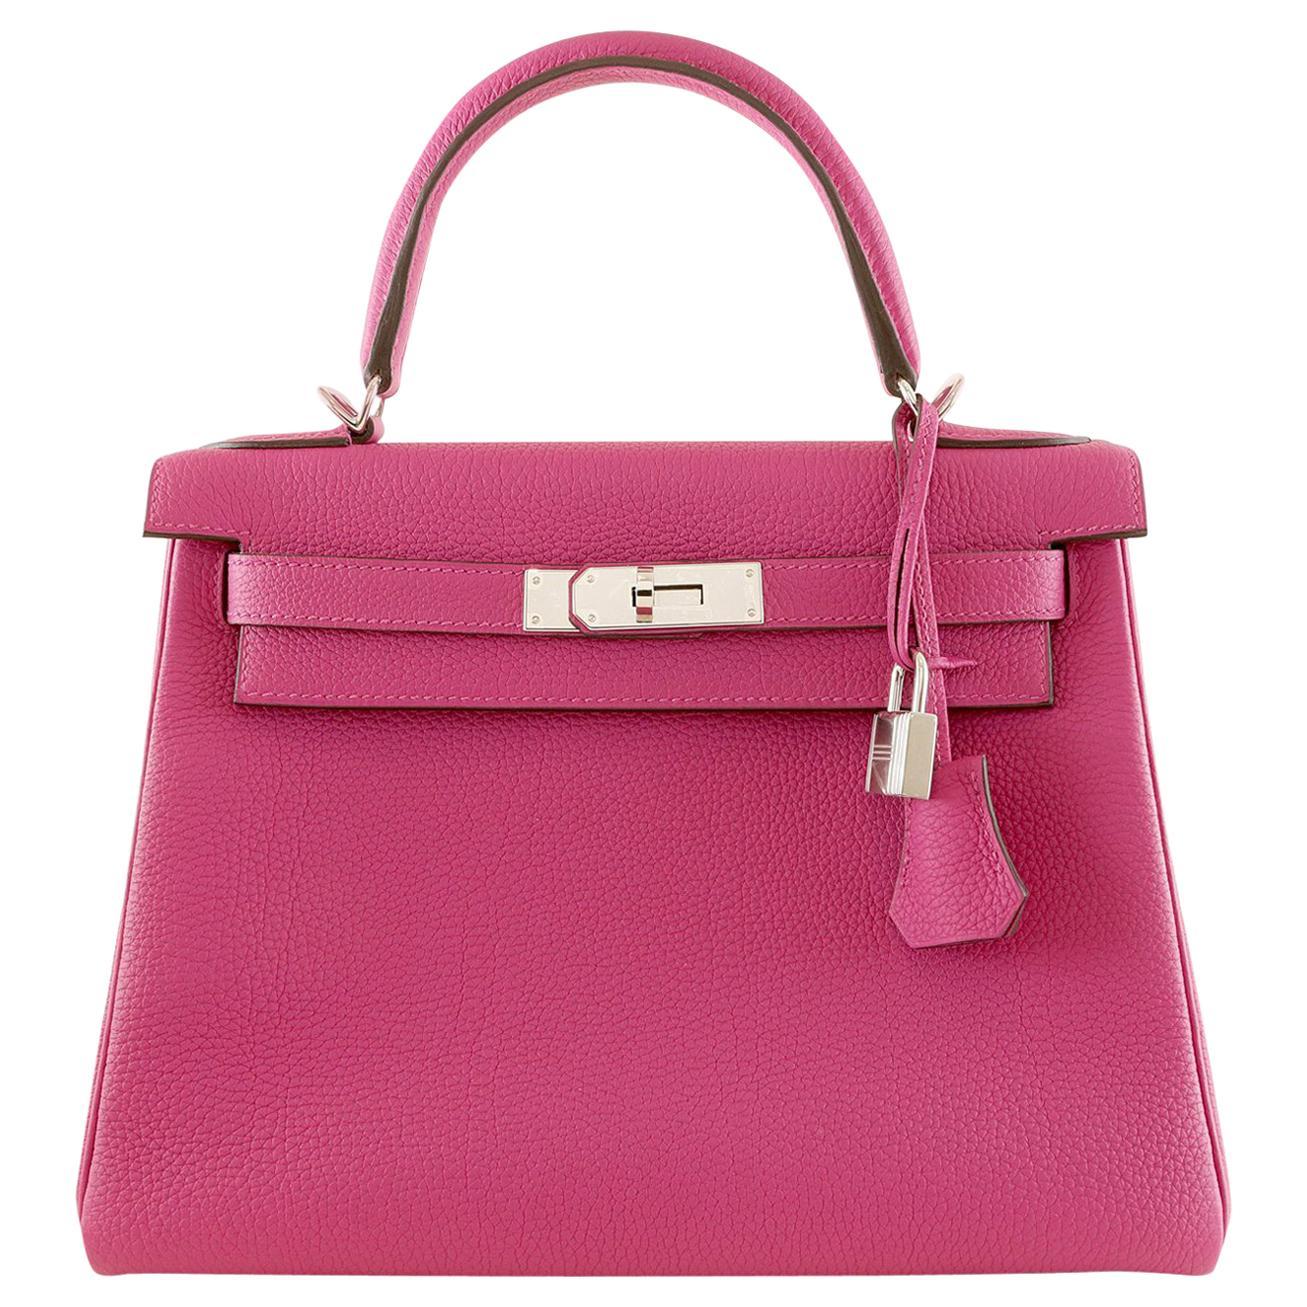 23c9fb92b26f Pink Hermes Bags - 125 For Sale on 1stdibs